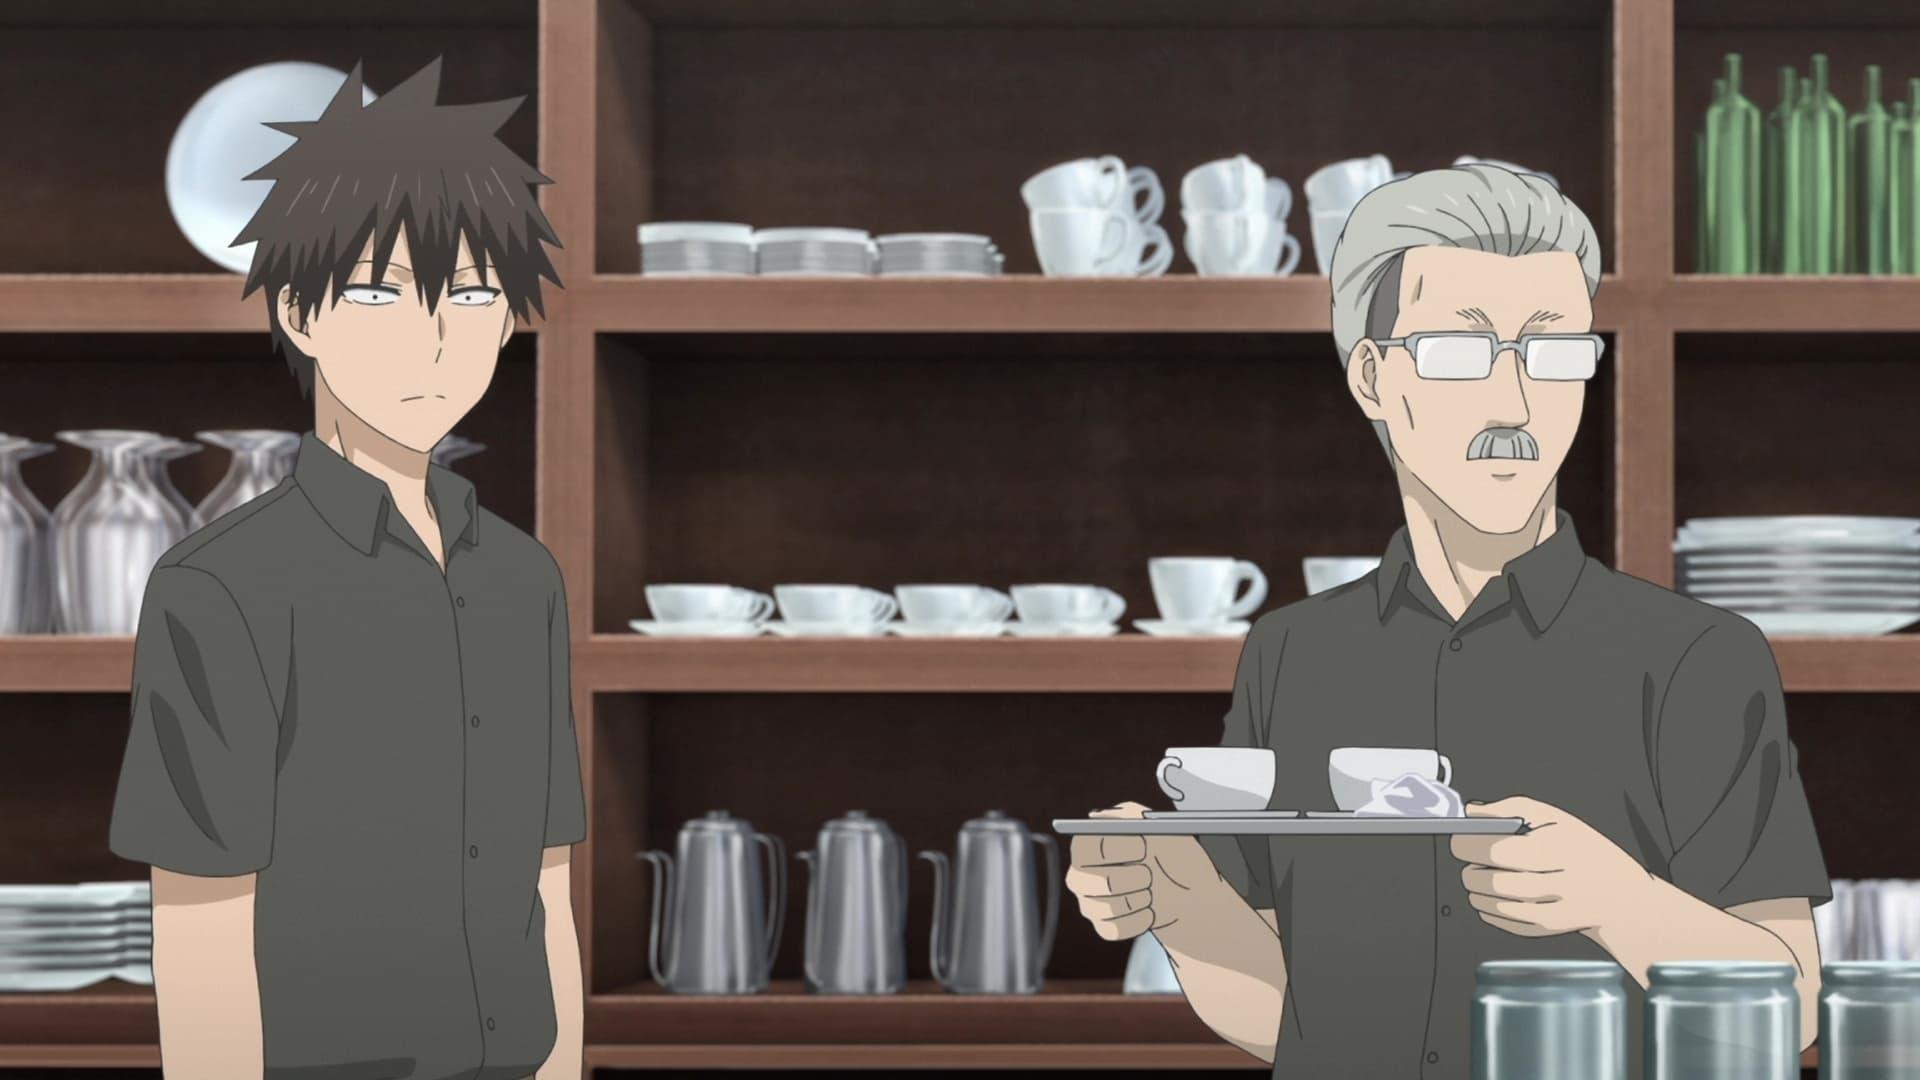 Uzaki-chan Wants to Hang Out! Season 1 :Episode 2  The Café Owner Wants a Glimpse